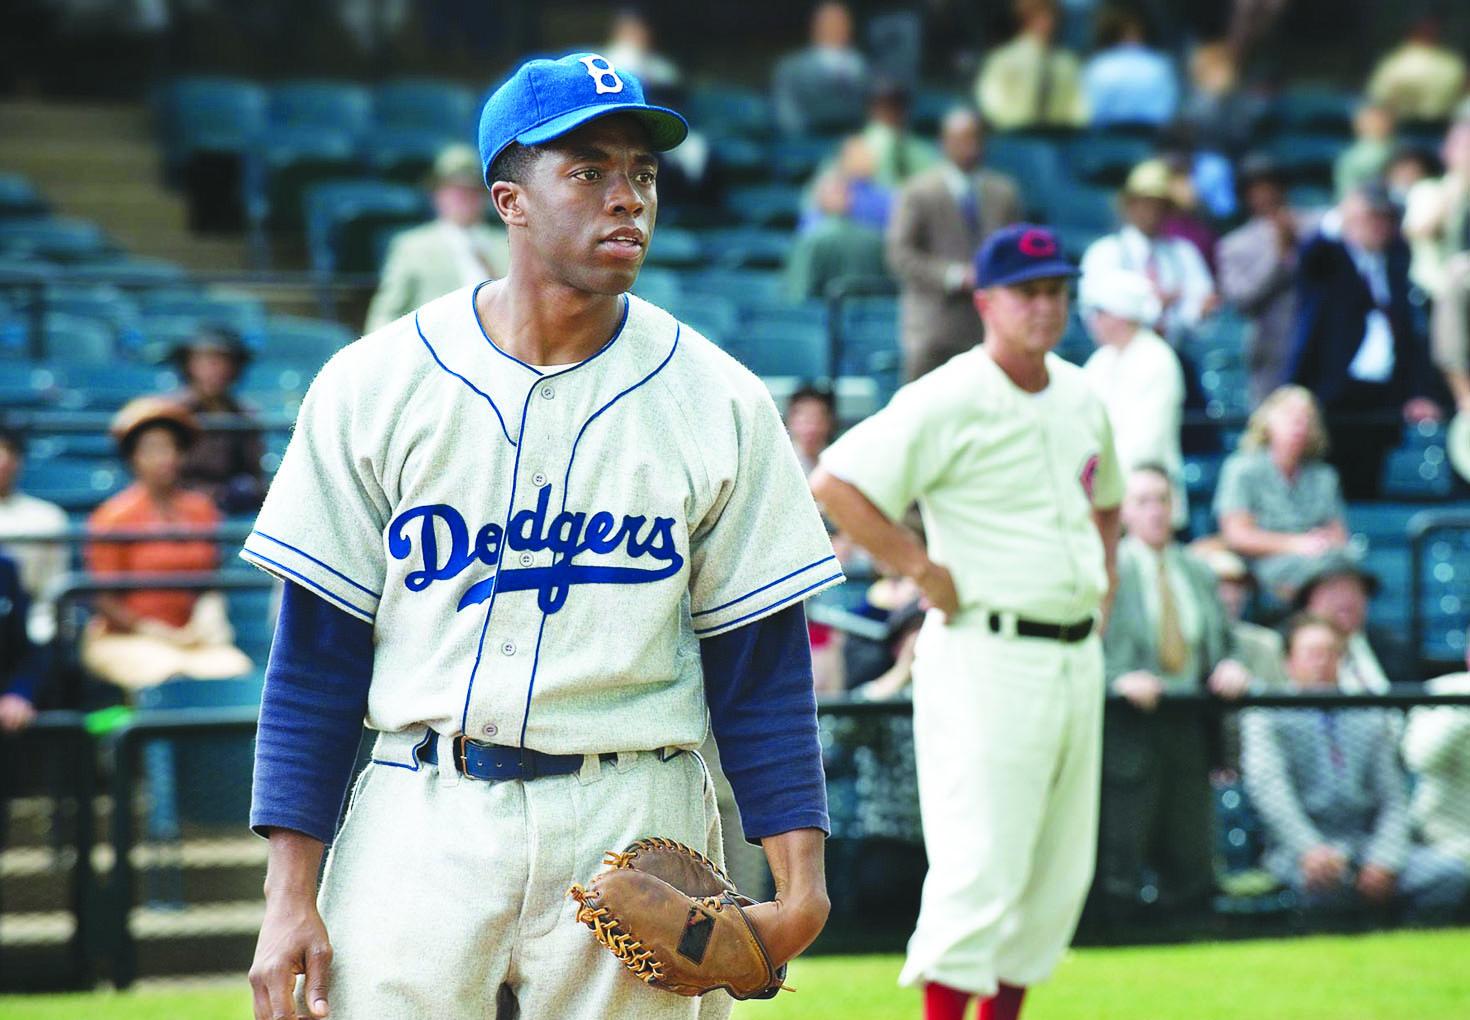 No. 1 box-office draw '42' illustrates Harrison Ford's star status